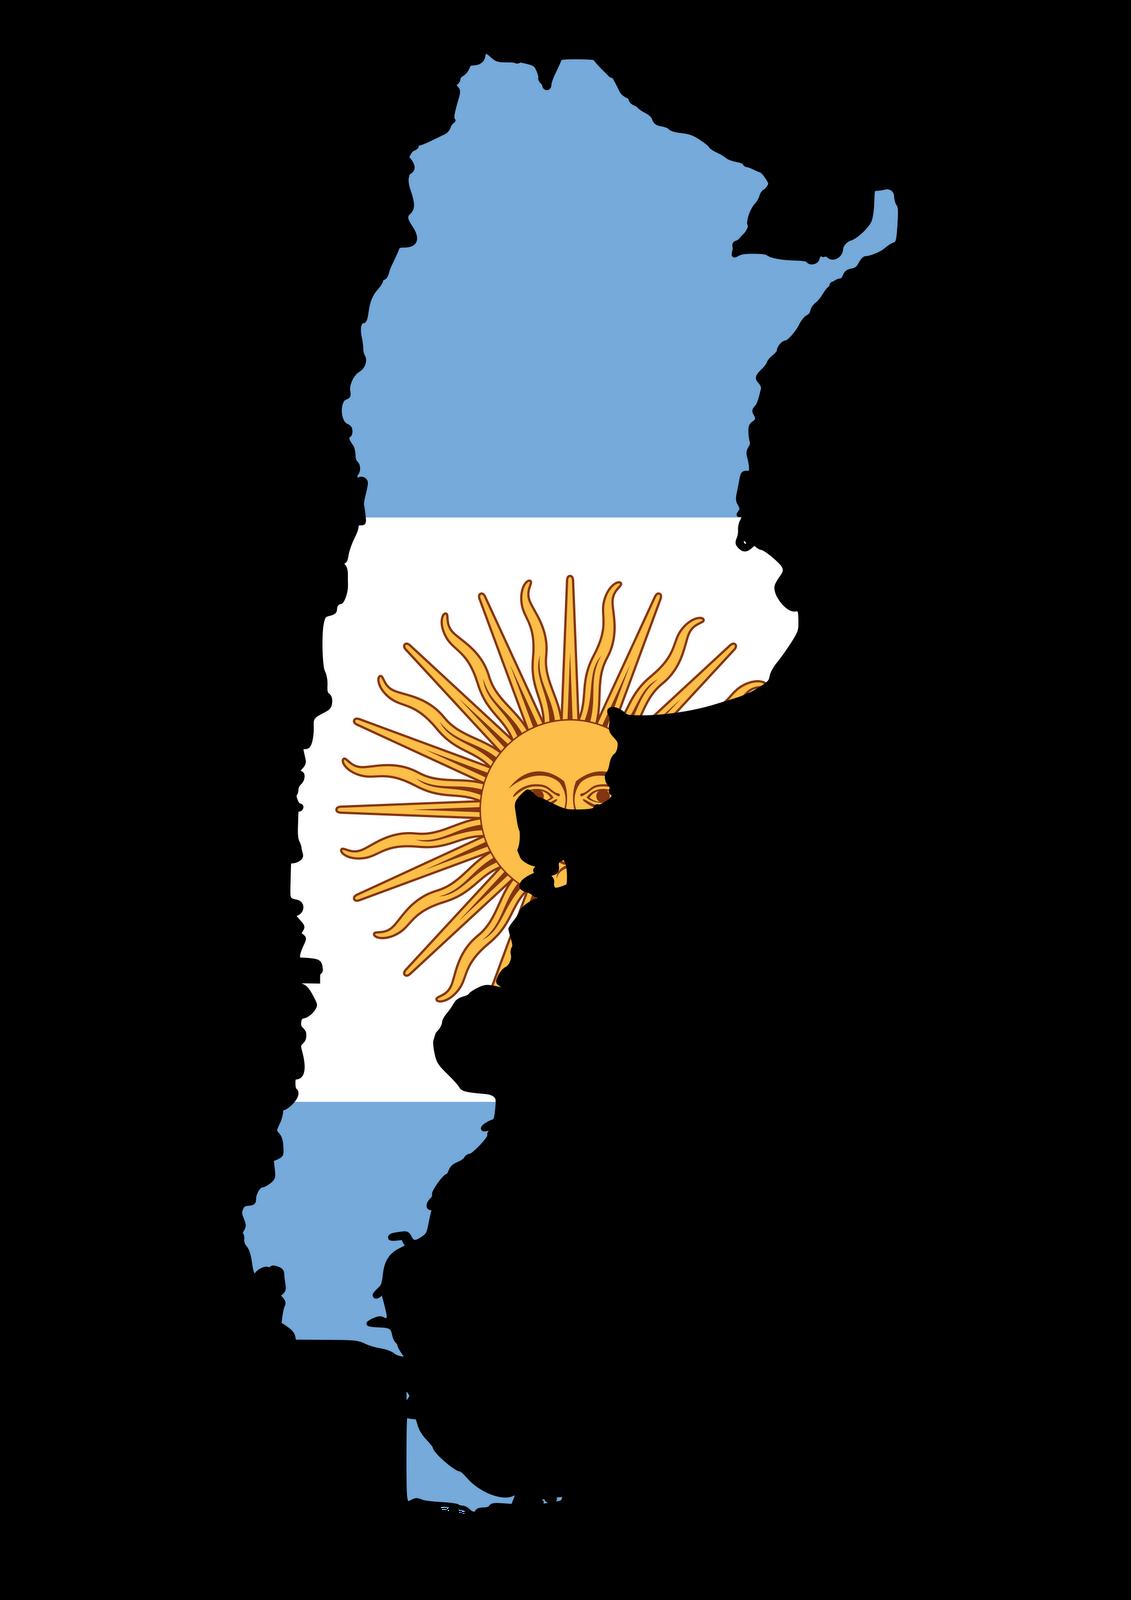 Argentina HttpbpblogspotcomCaZGIqhxYlsTfranrRI - Argentina map vector